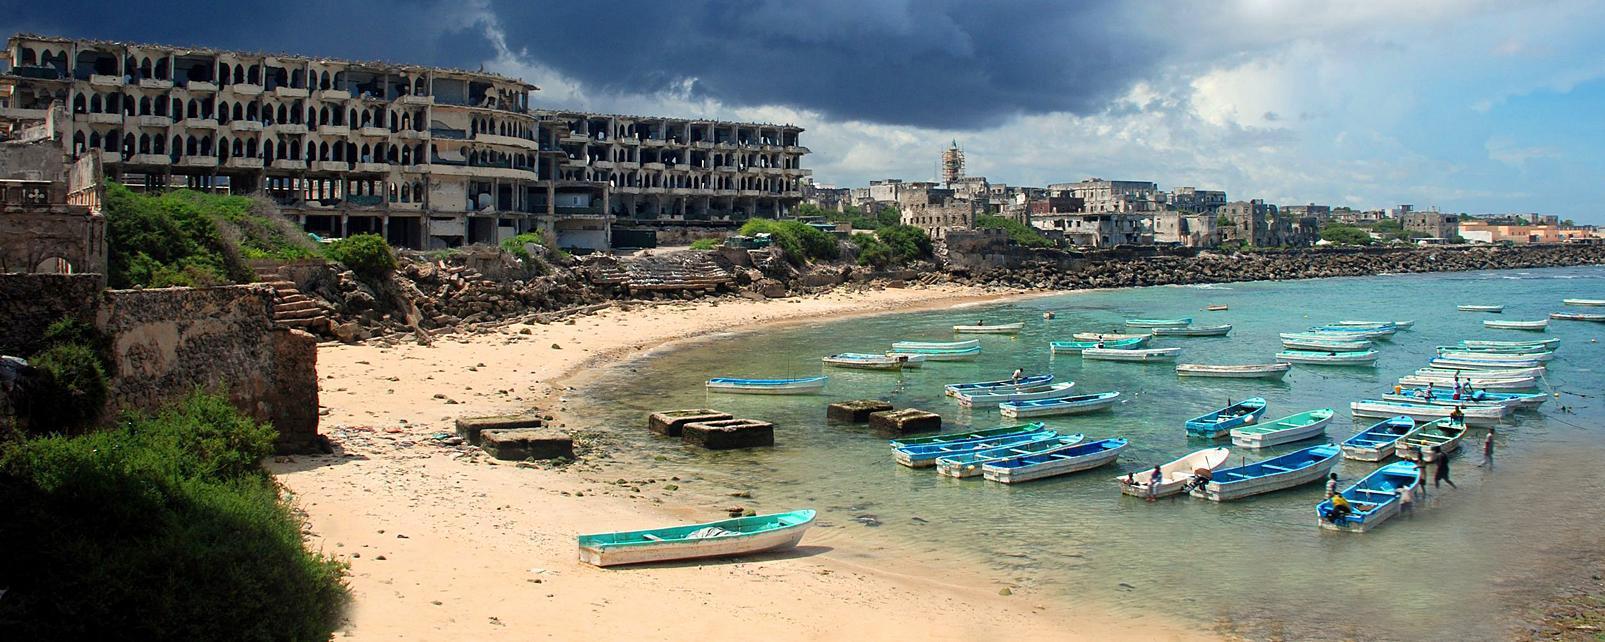 travel to somalia discover somalia with easyvoyage. Black Bedroom Furniture Sets. Home Design Ideas